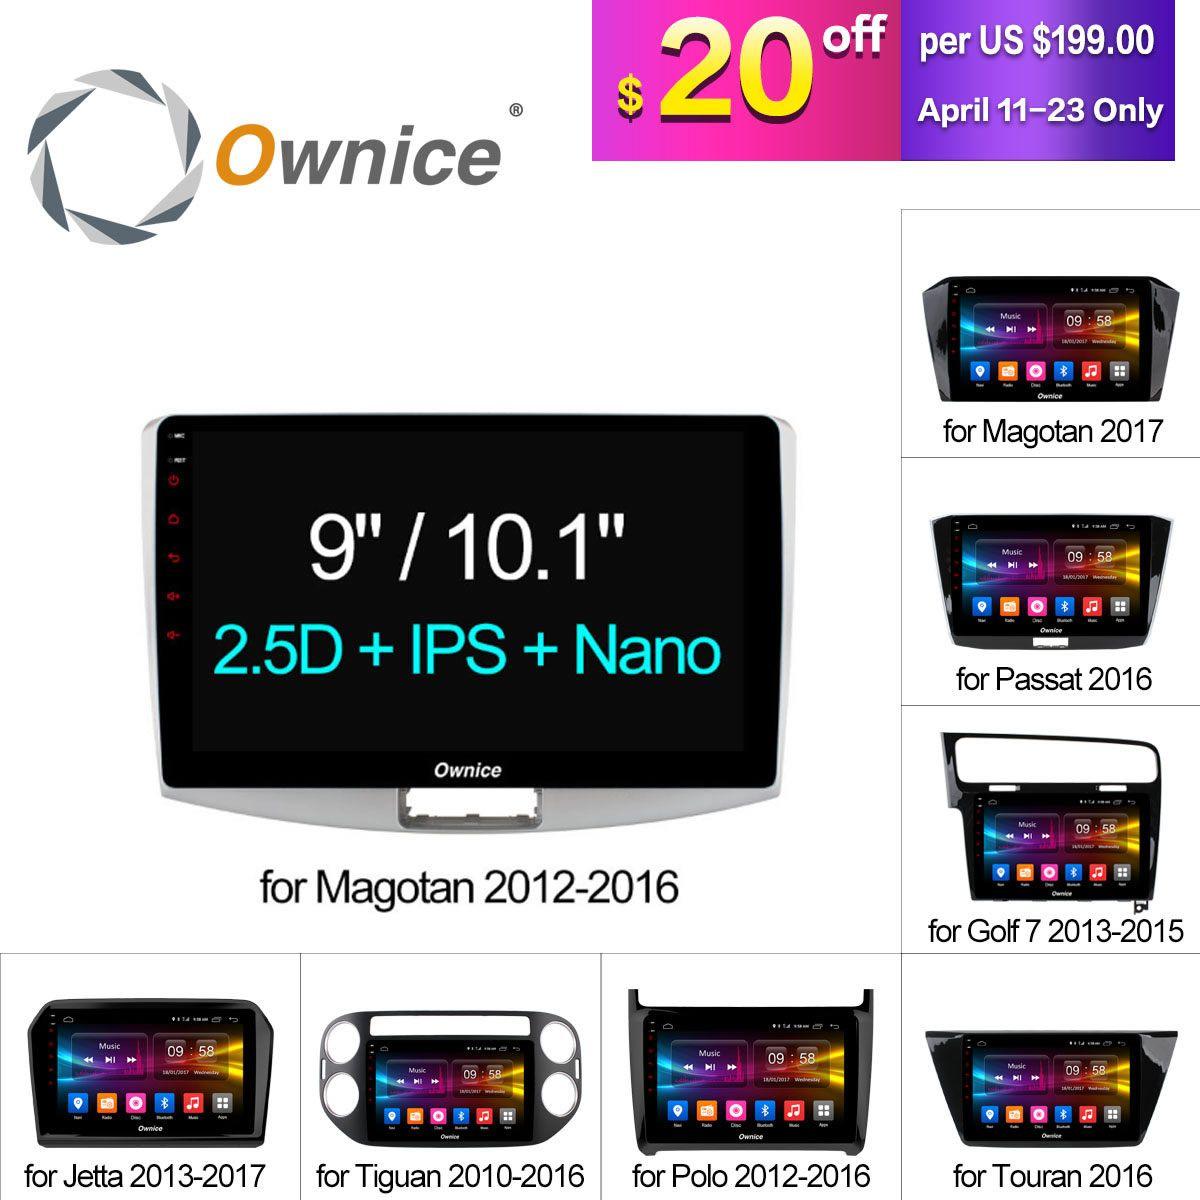 Ownice C500 + Octa-core 10,1